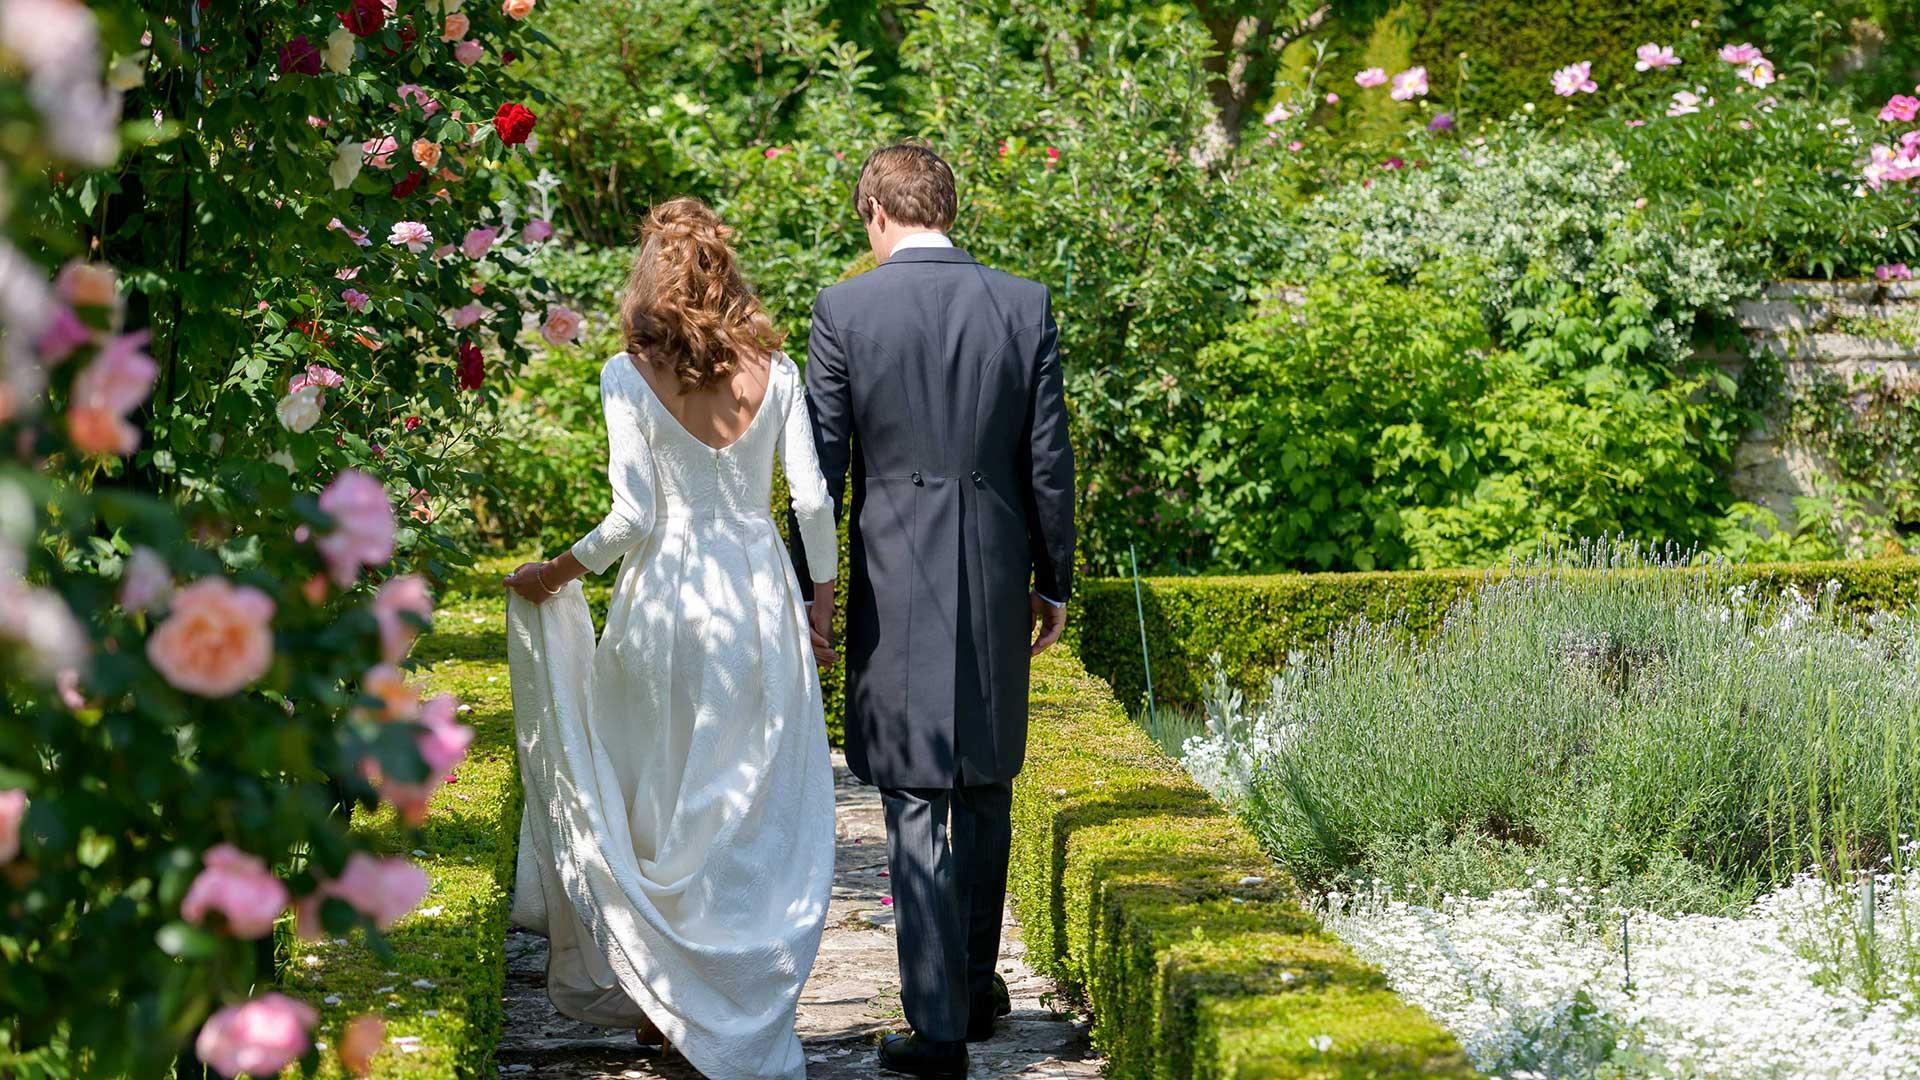 photographe-mariage-ile-de-france-11